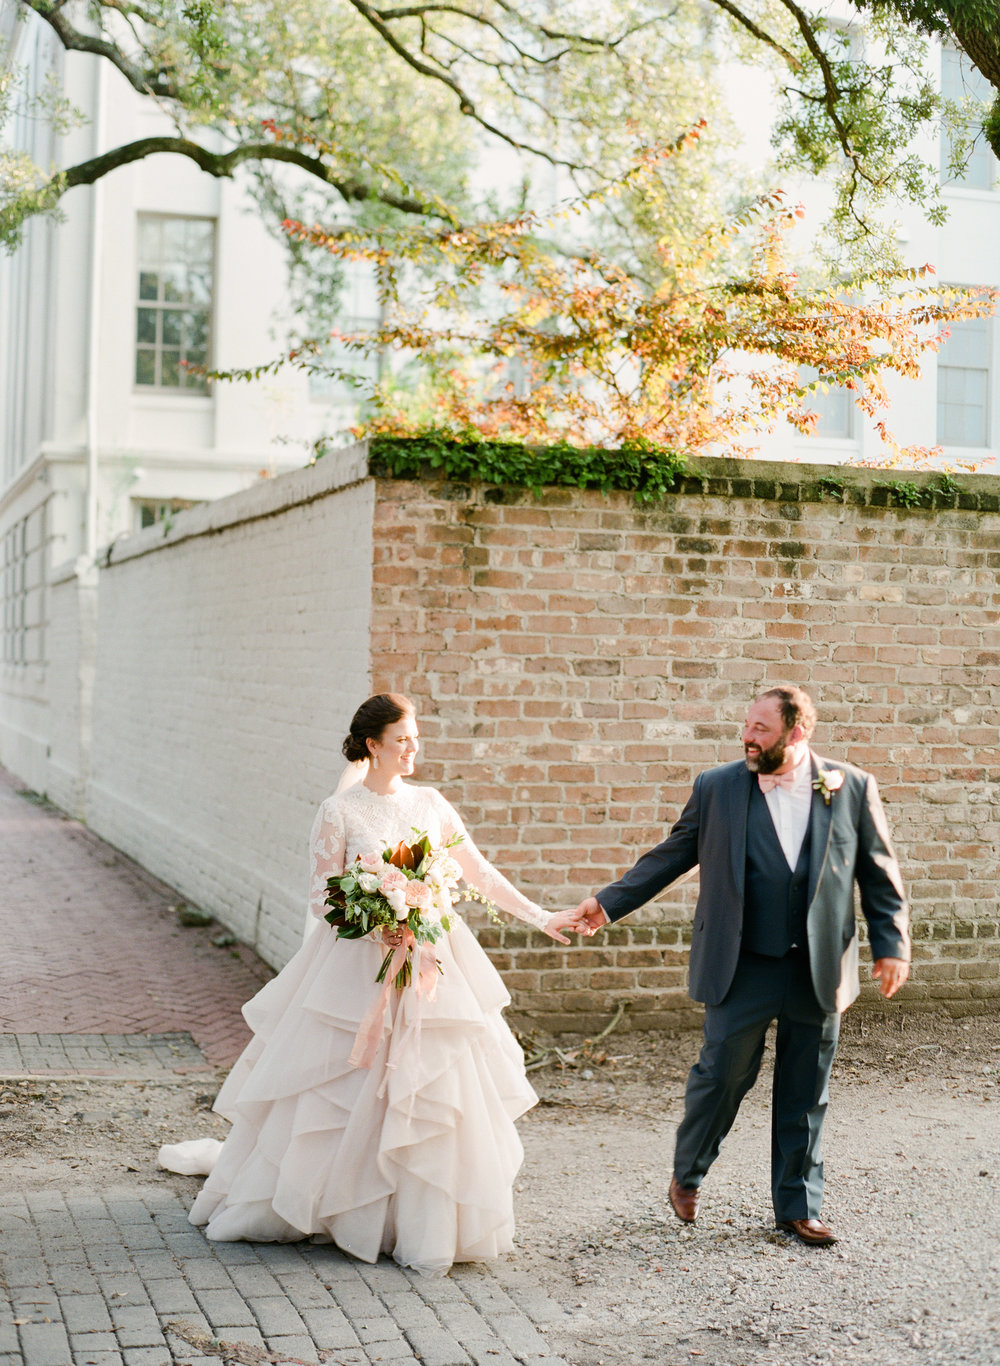 savannah-cha-bella-wedding-26.jpg